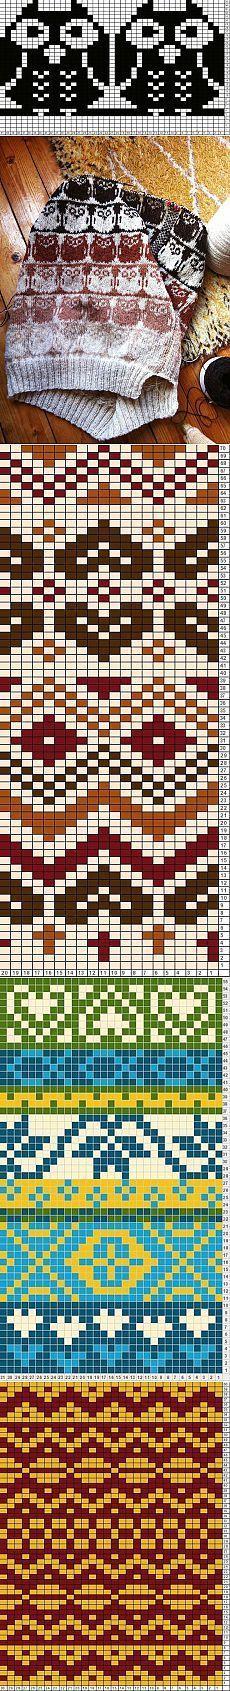 current Images knitting charts owl Style жаккард Most current Images knitting charts owl Style жаккард ВЯЗАНИЕ ДЛЯ СУМАСШЕДШИХ / Снимка 67 - Burda 2018 - svetlyachoks Owl Crochet Chart pattern by Agnes Barton annadrianna — «Pattern Libra. Fair Isle Knitting Patterns, Fair Isle Pattern, Knitting Charts, Loom Knitting, Knitting Designs, Knitting Stitches, Knitting Projects, Knitting Ideas, Filet Crochet